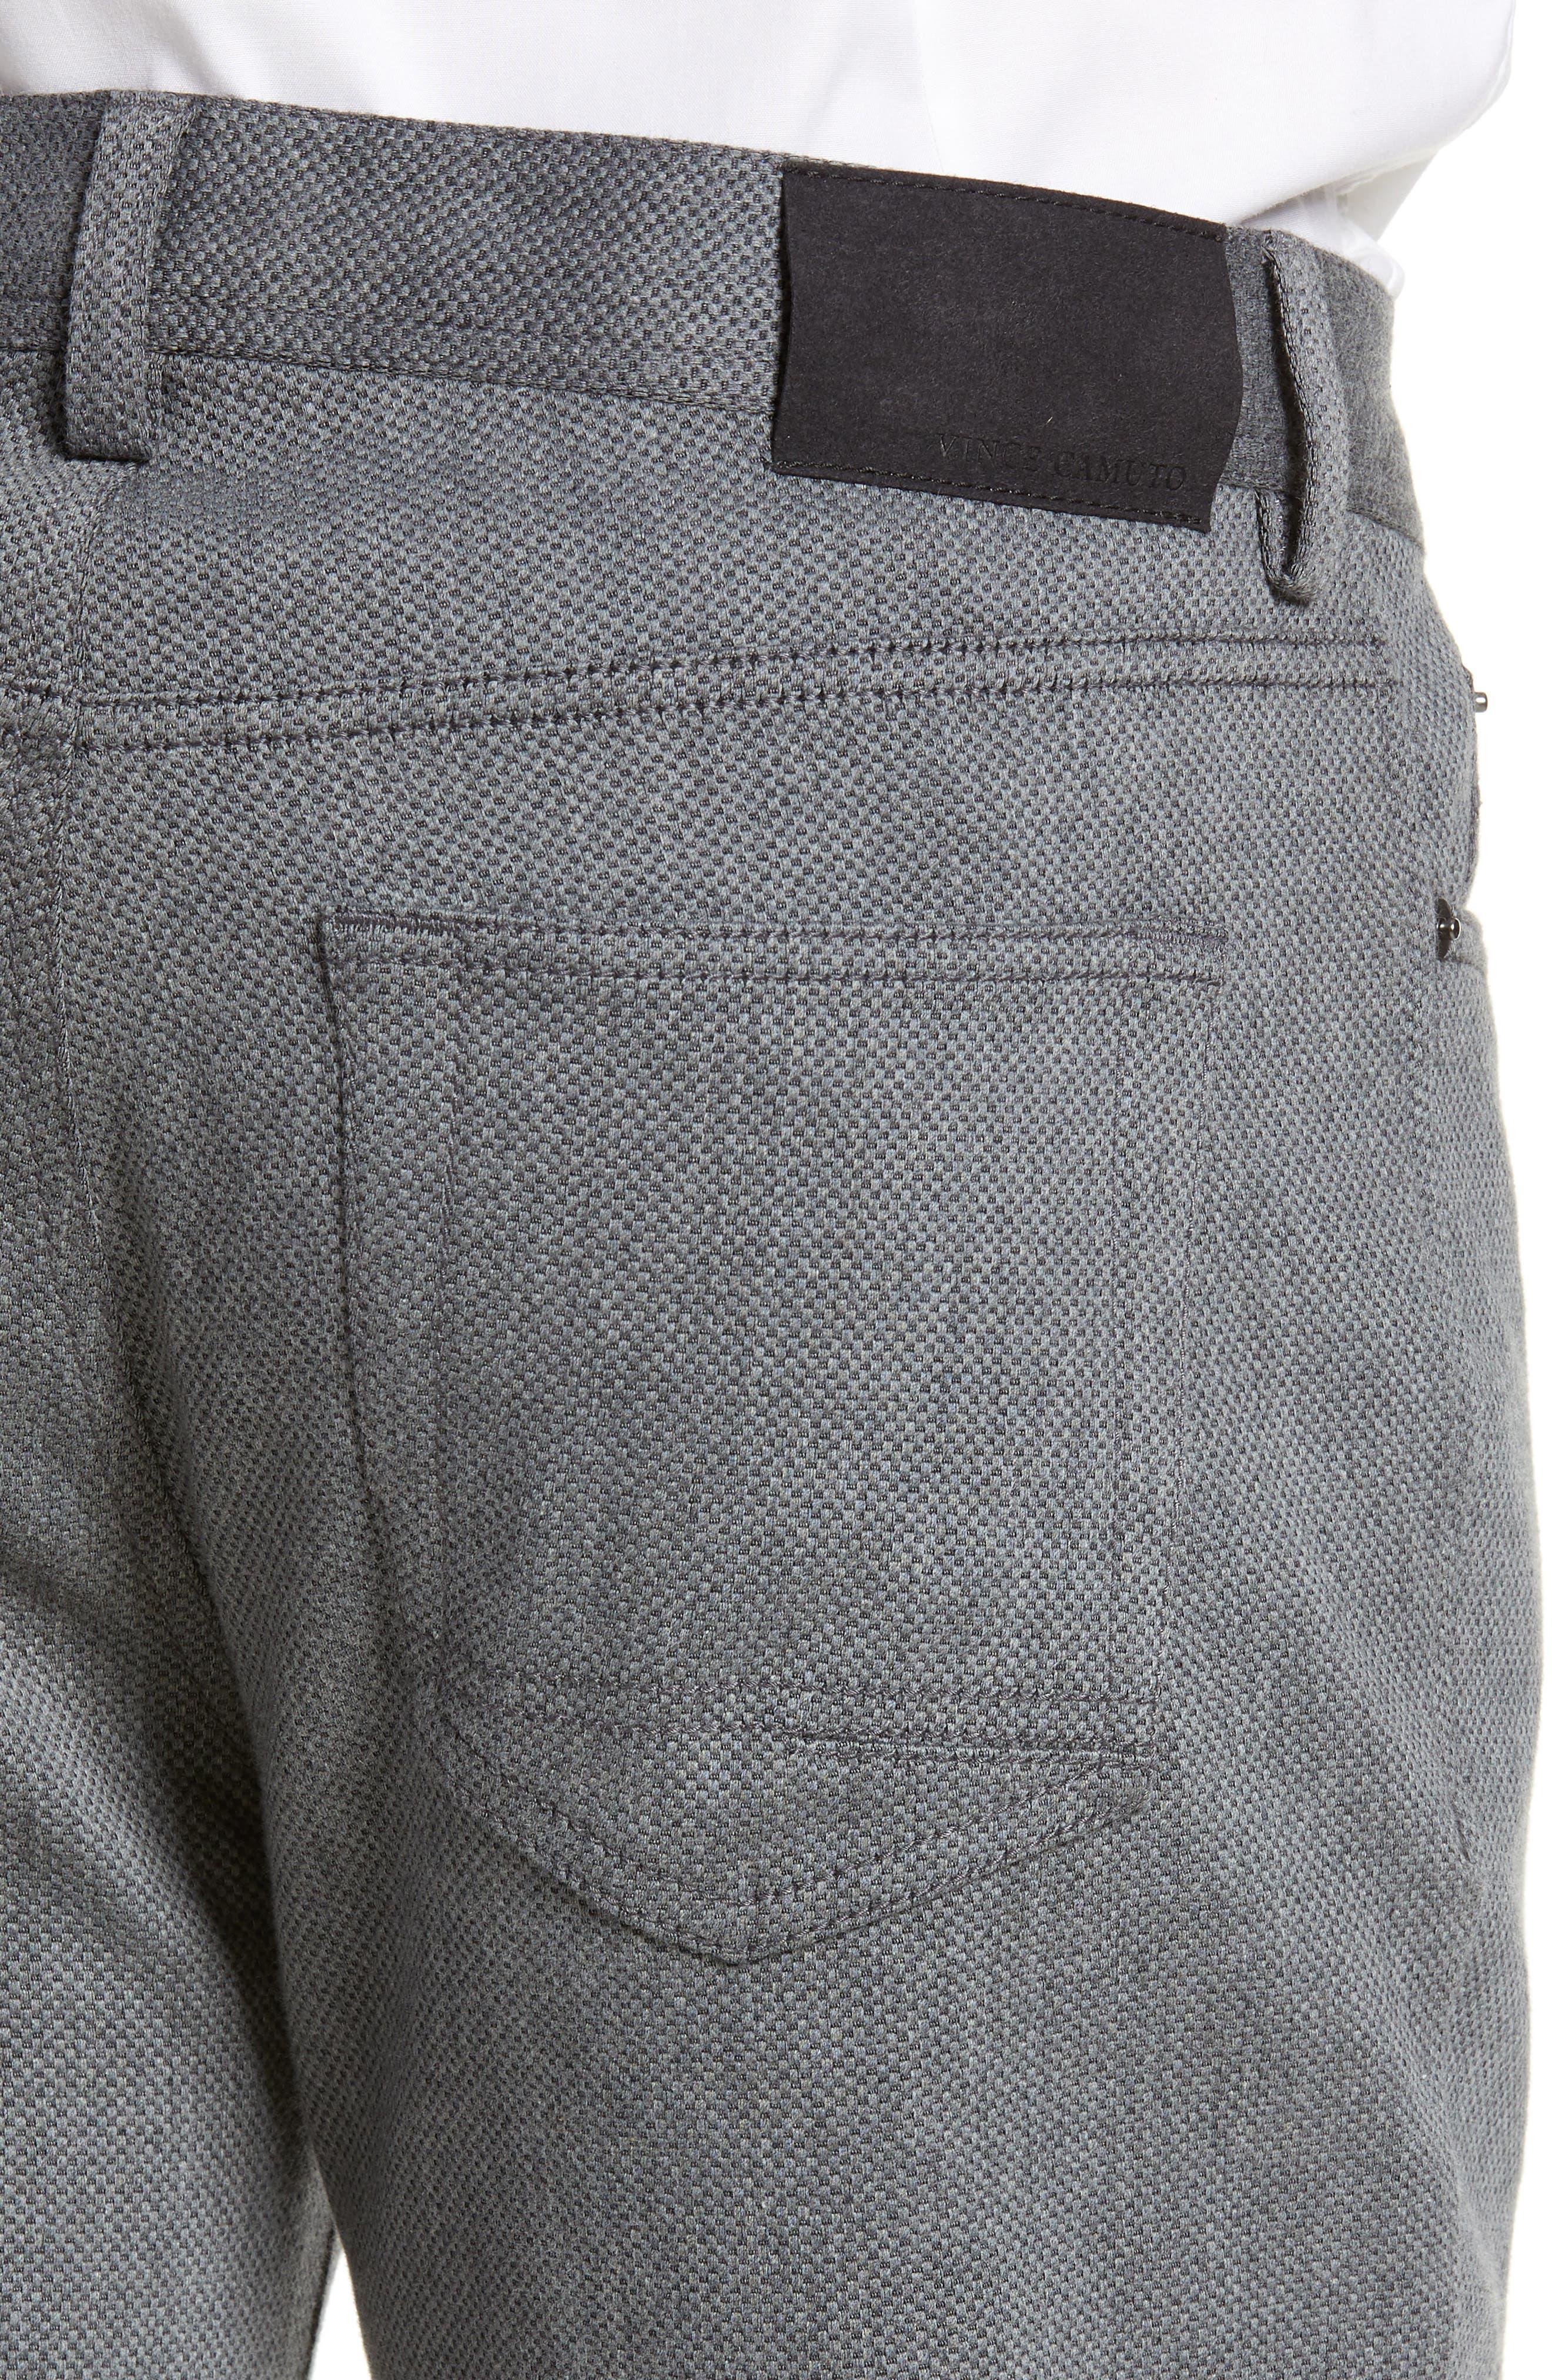 VINCE CAMUTO, Straight Leg Five Pocket Stretch Pants, Alternate thumbnail 4, color, HEATHER CHARCOAL CROSSHATCH